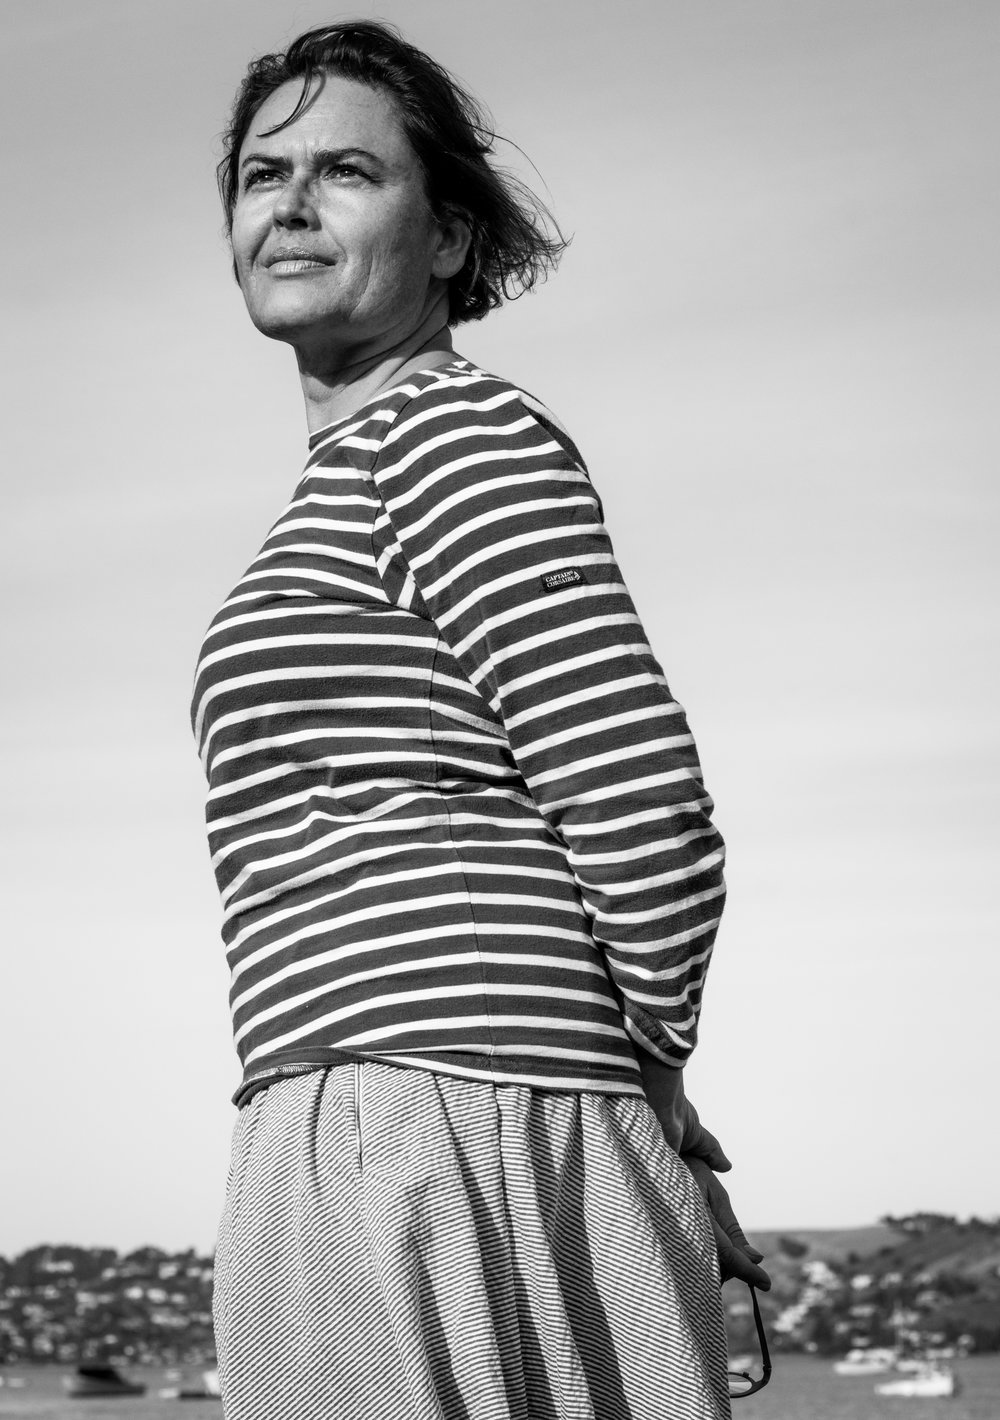 Portraits-11.jpg